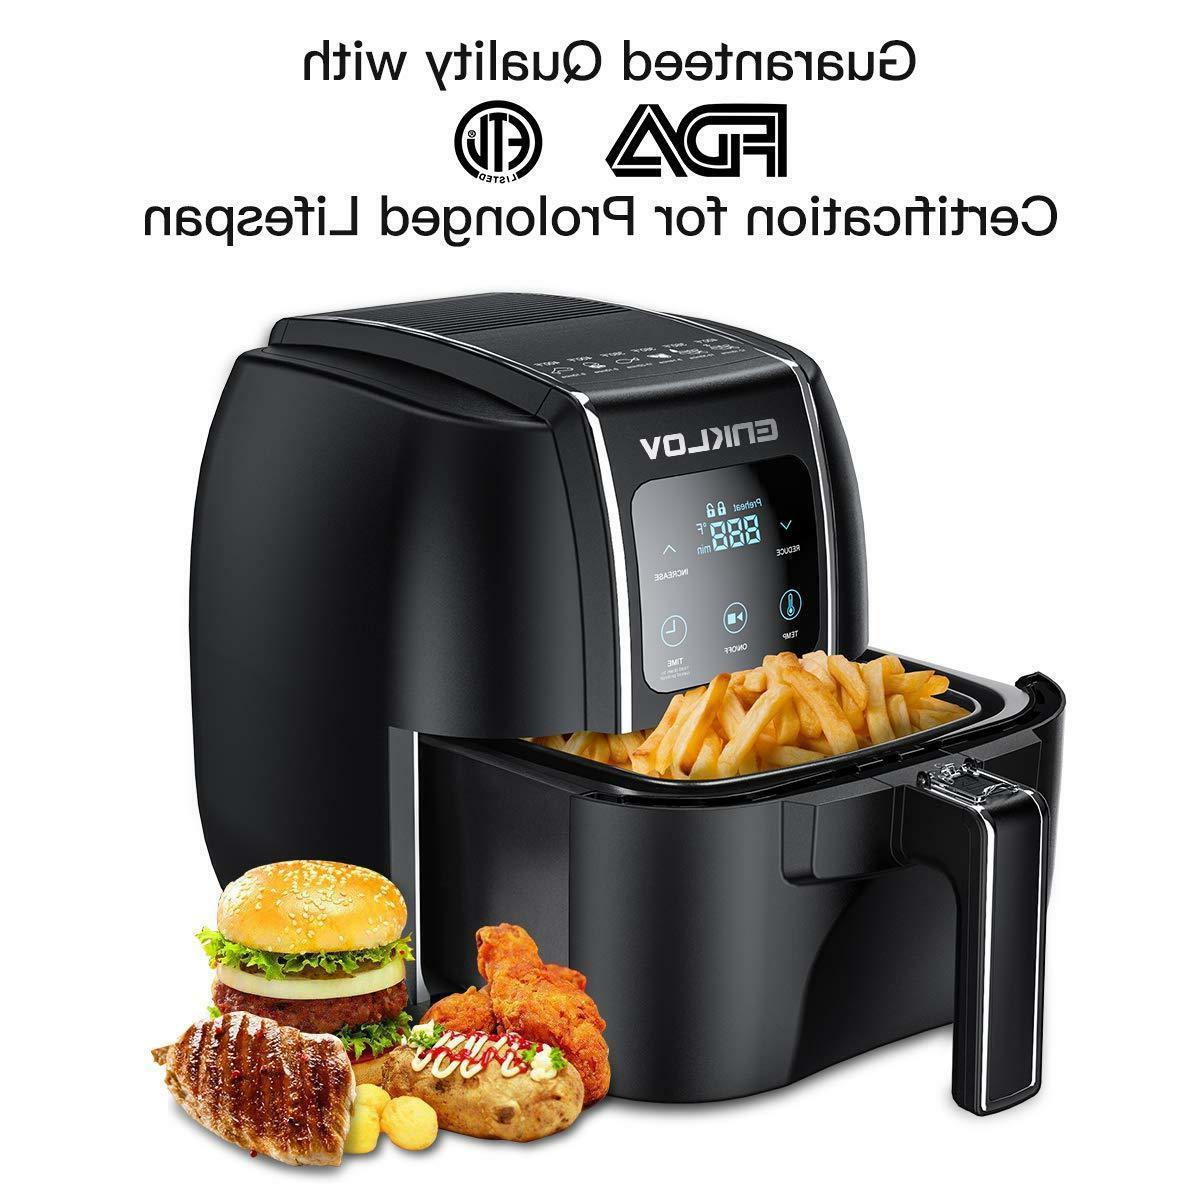 Air Fryer 5.5QT XL with ENKLOV 1 Control Oil Less